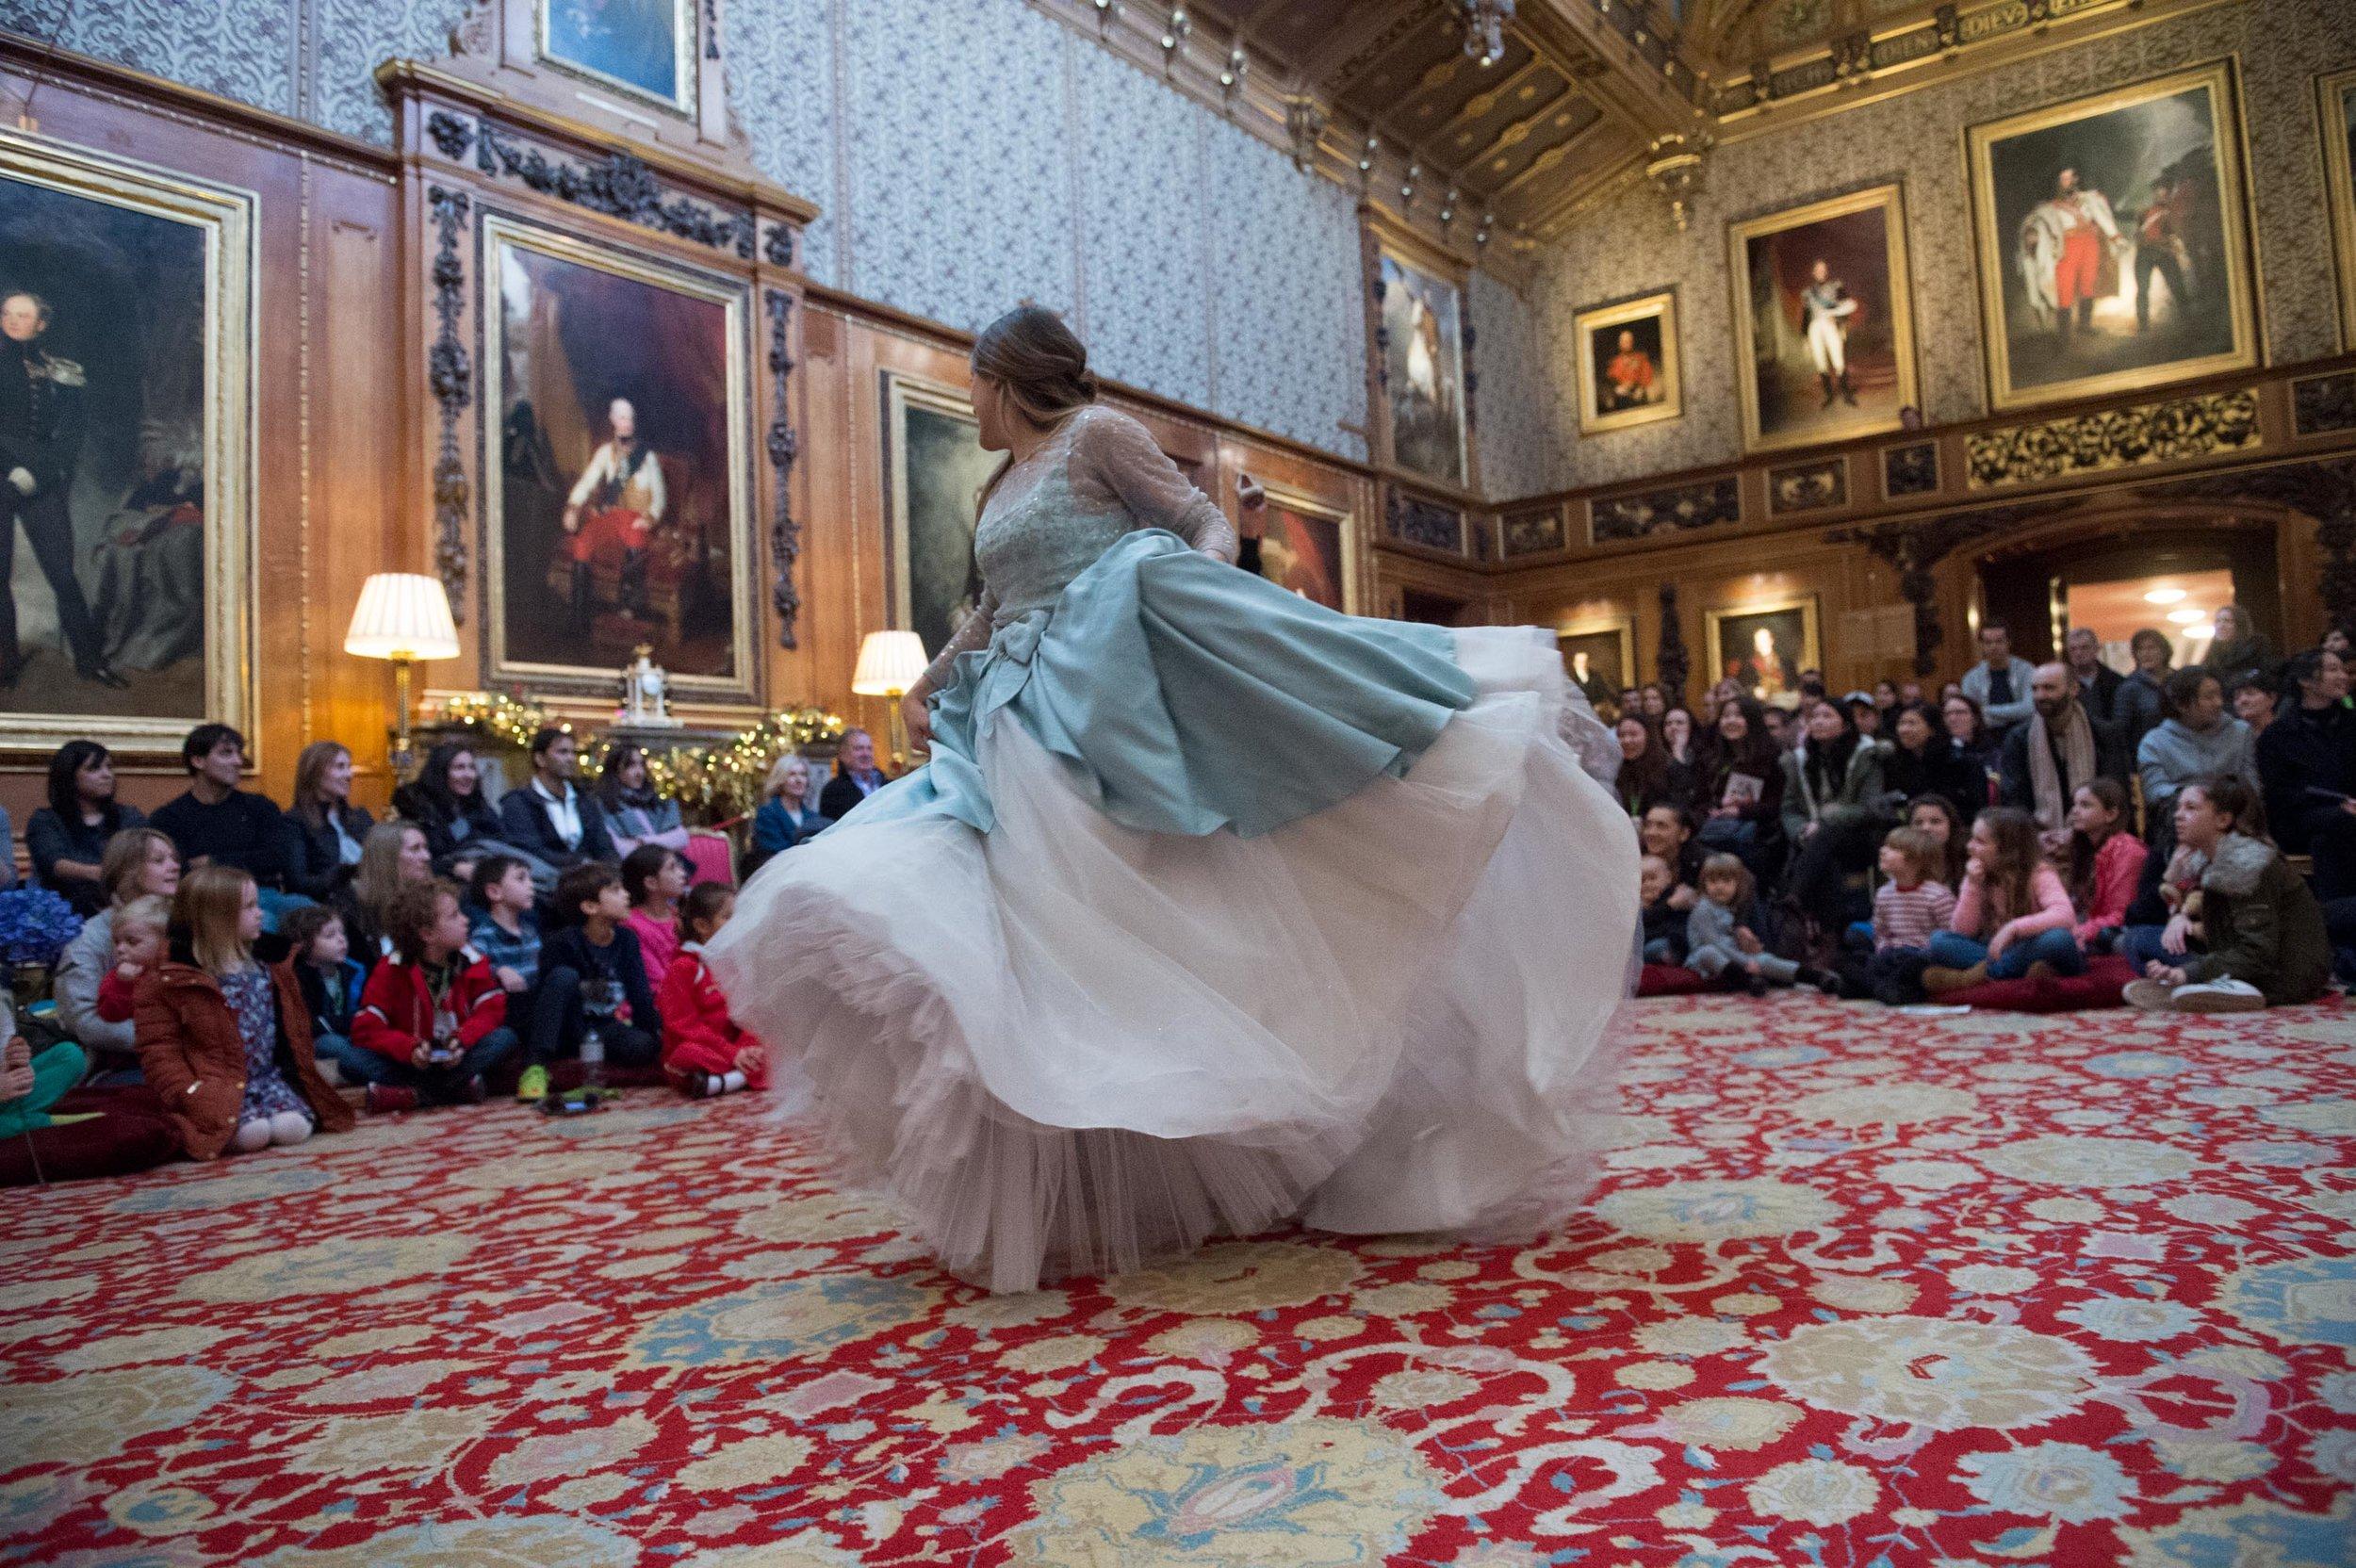 Cinderella - The Waterloo Chamber, Windsor Castle